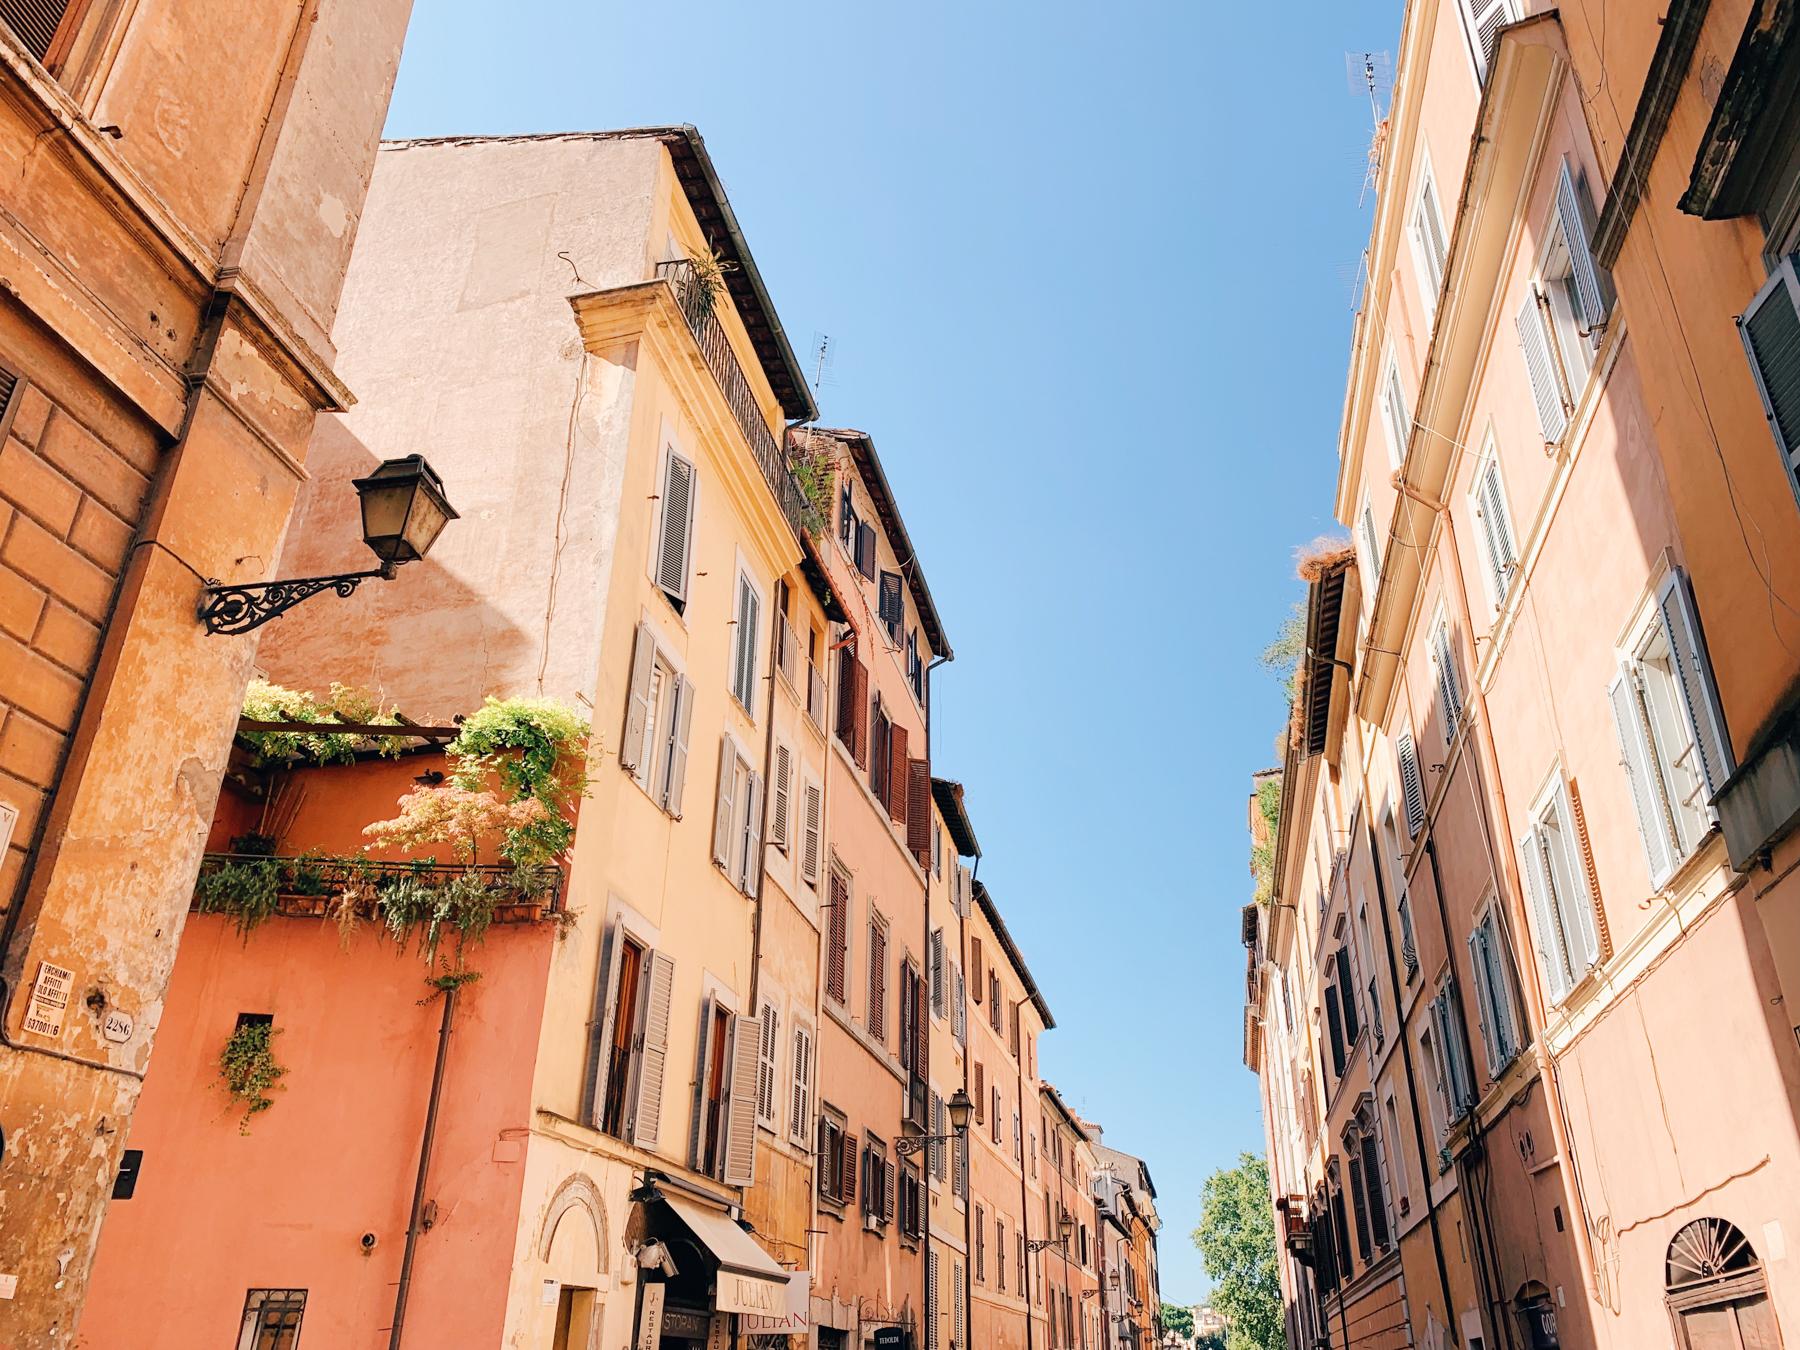 The beautiful sights around Piazza Navona.